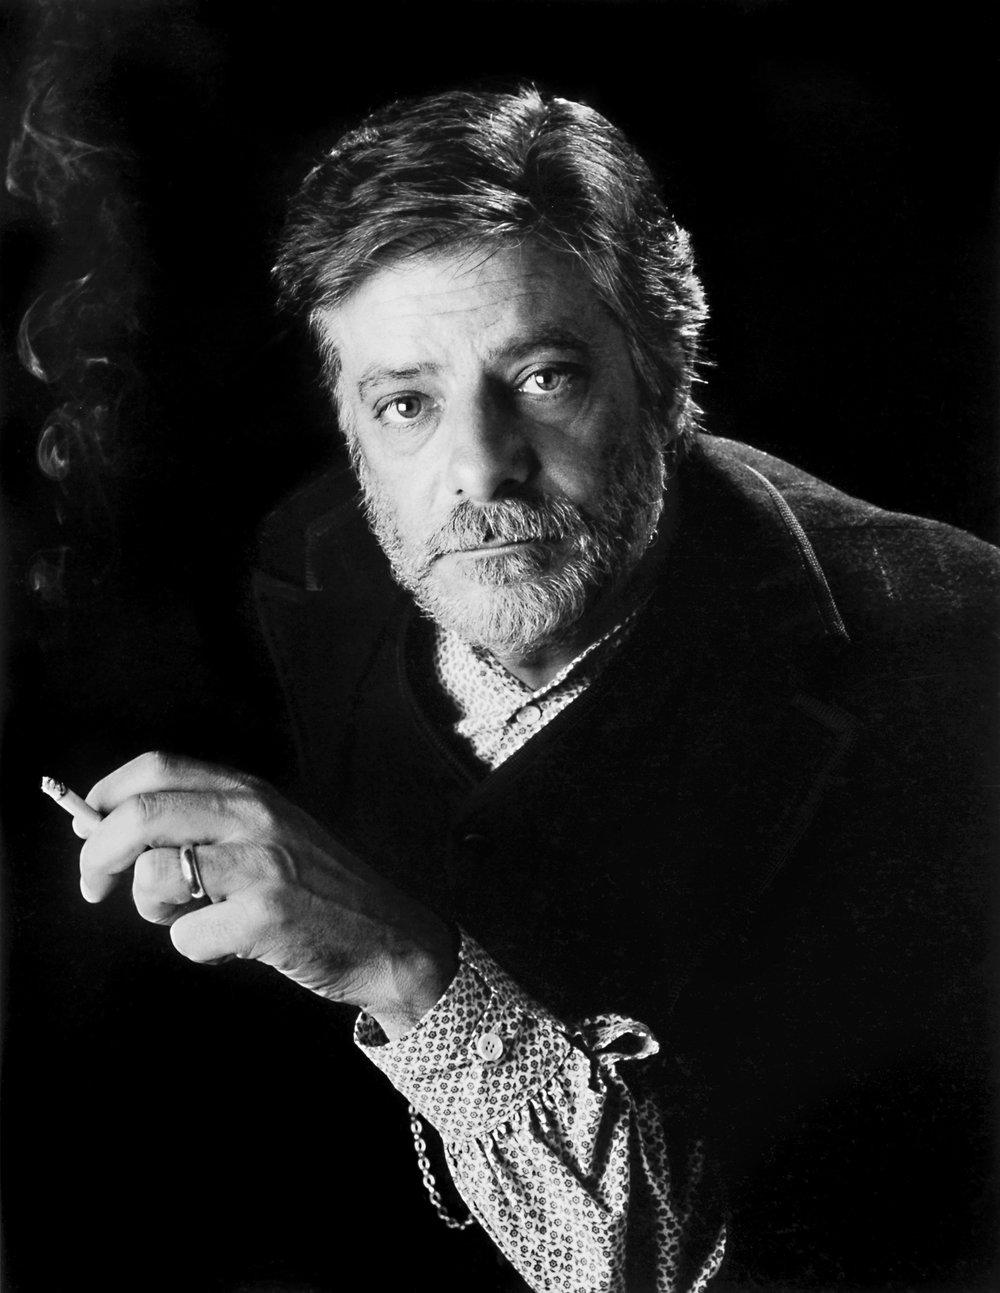 Giancarlo Giannini Sonoro, California 1989_WEBSITE_30_FINAL.jpg